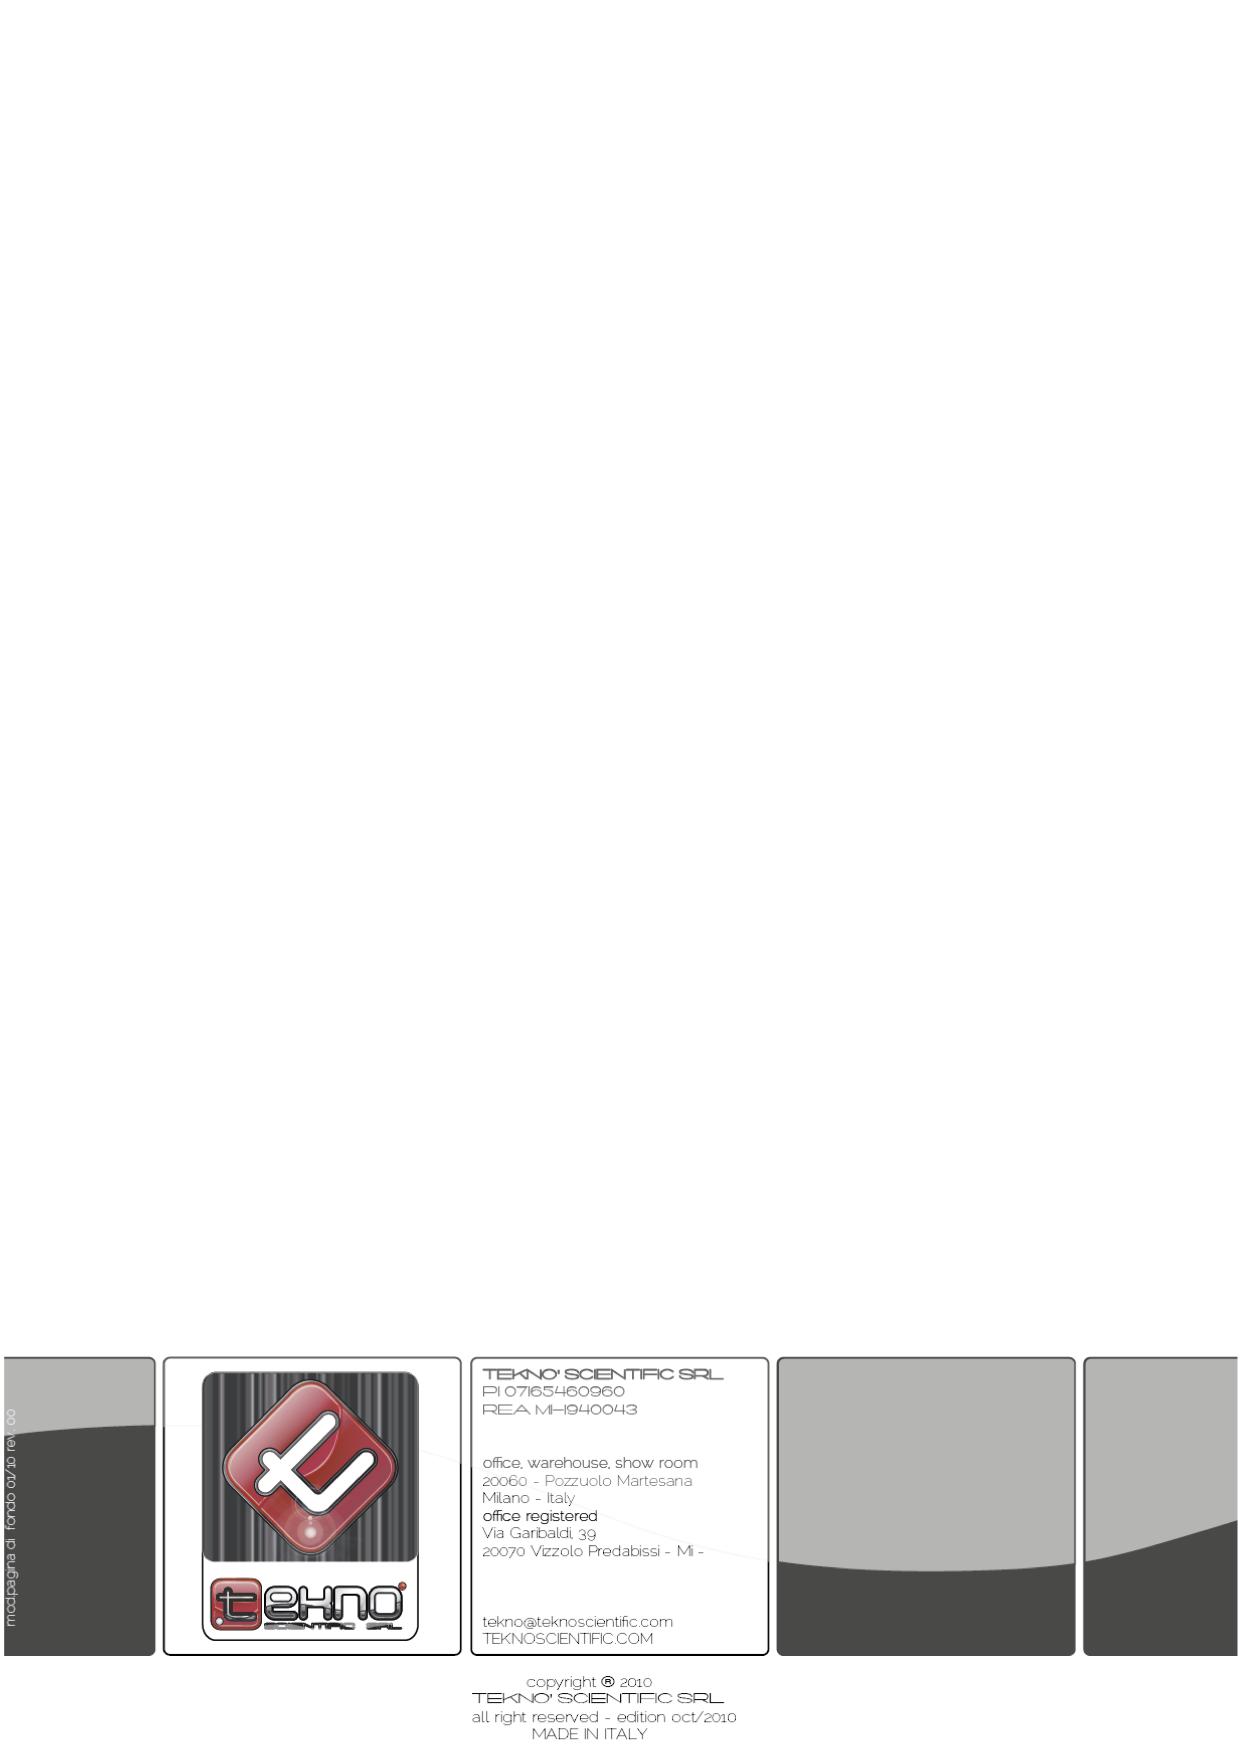 EVO Schede Tecniche materiali copia 22.png